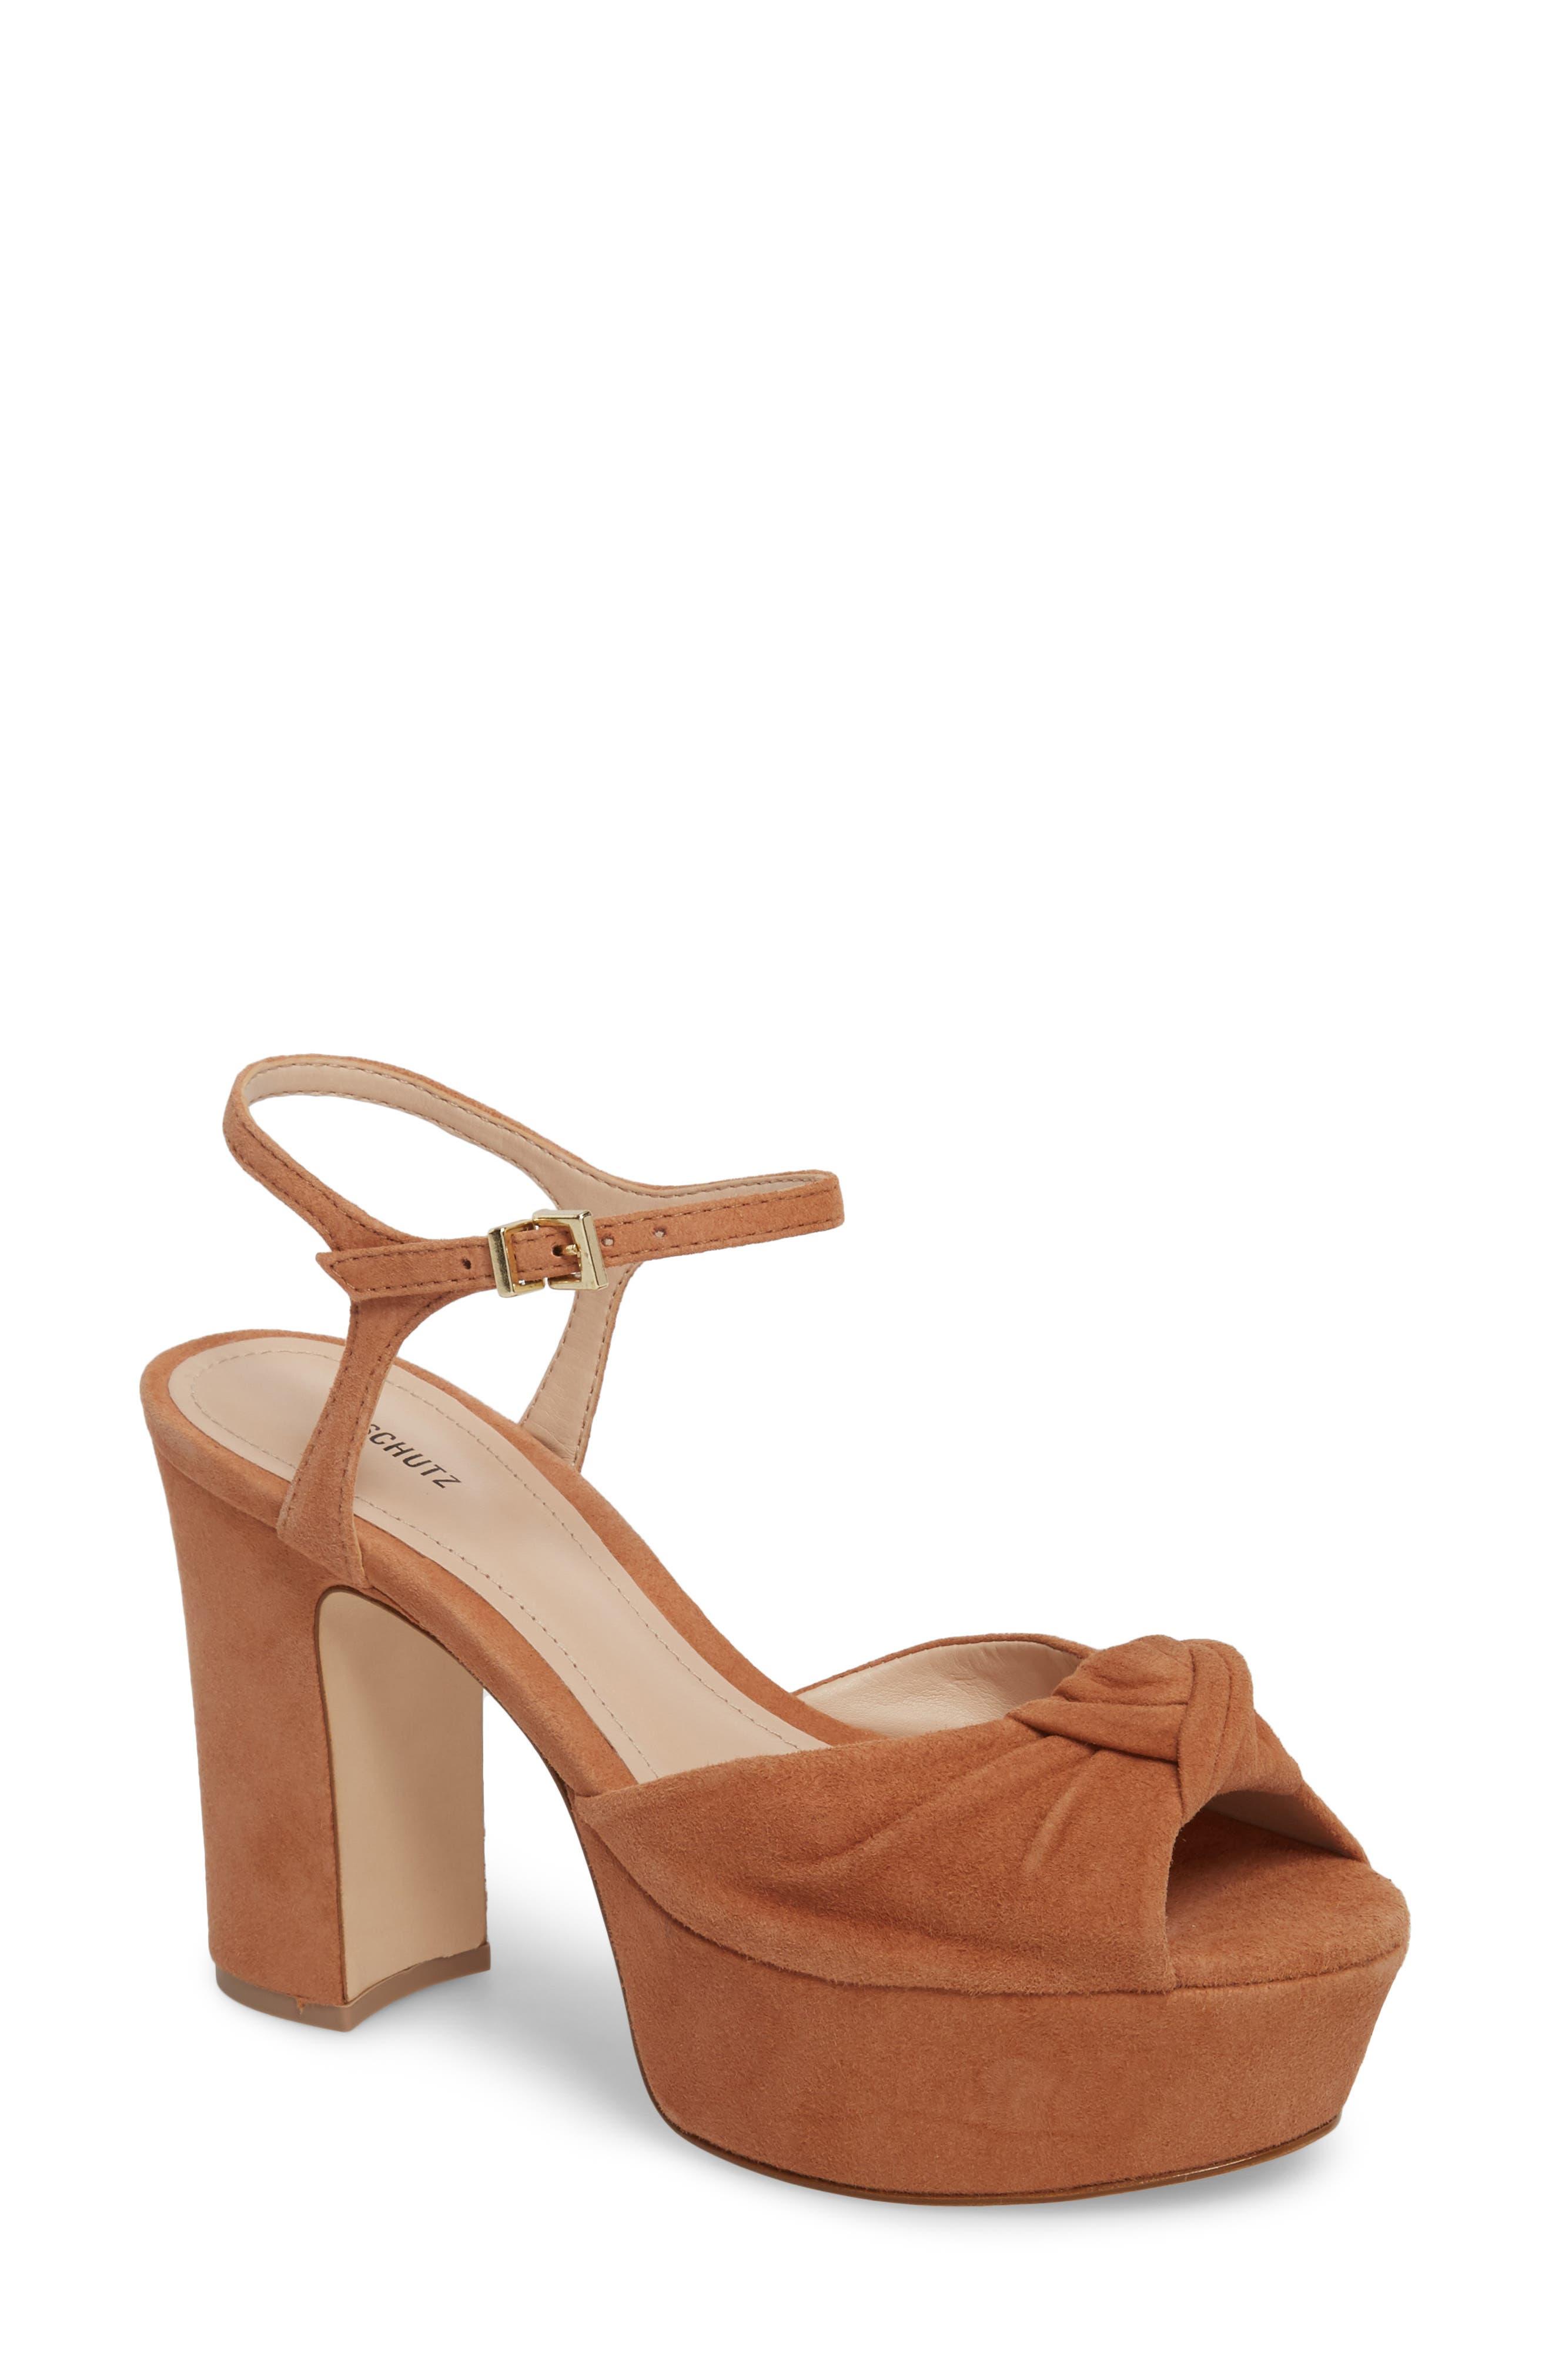 Thalyta Platform Sandal,                         Main,                         color, Toasted Nut